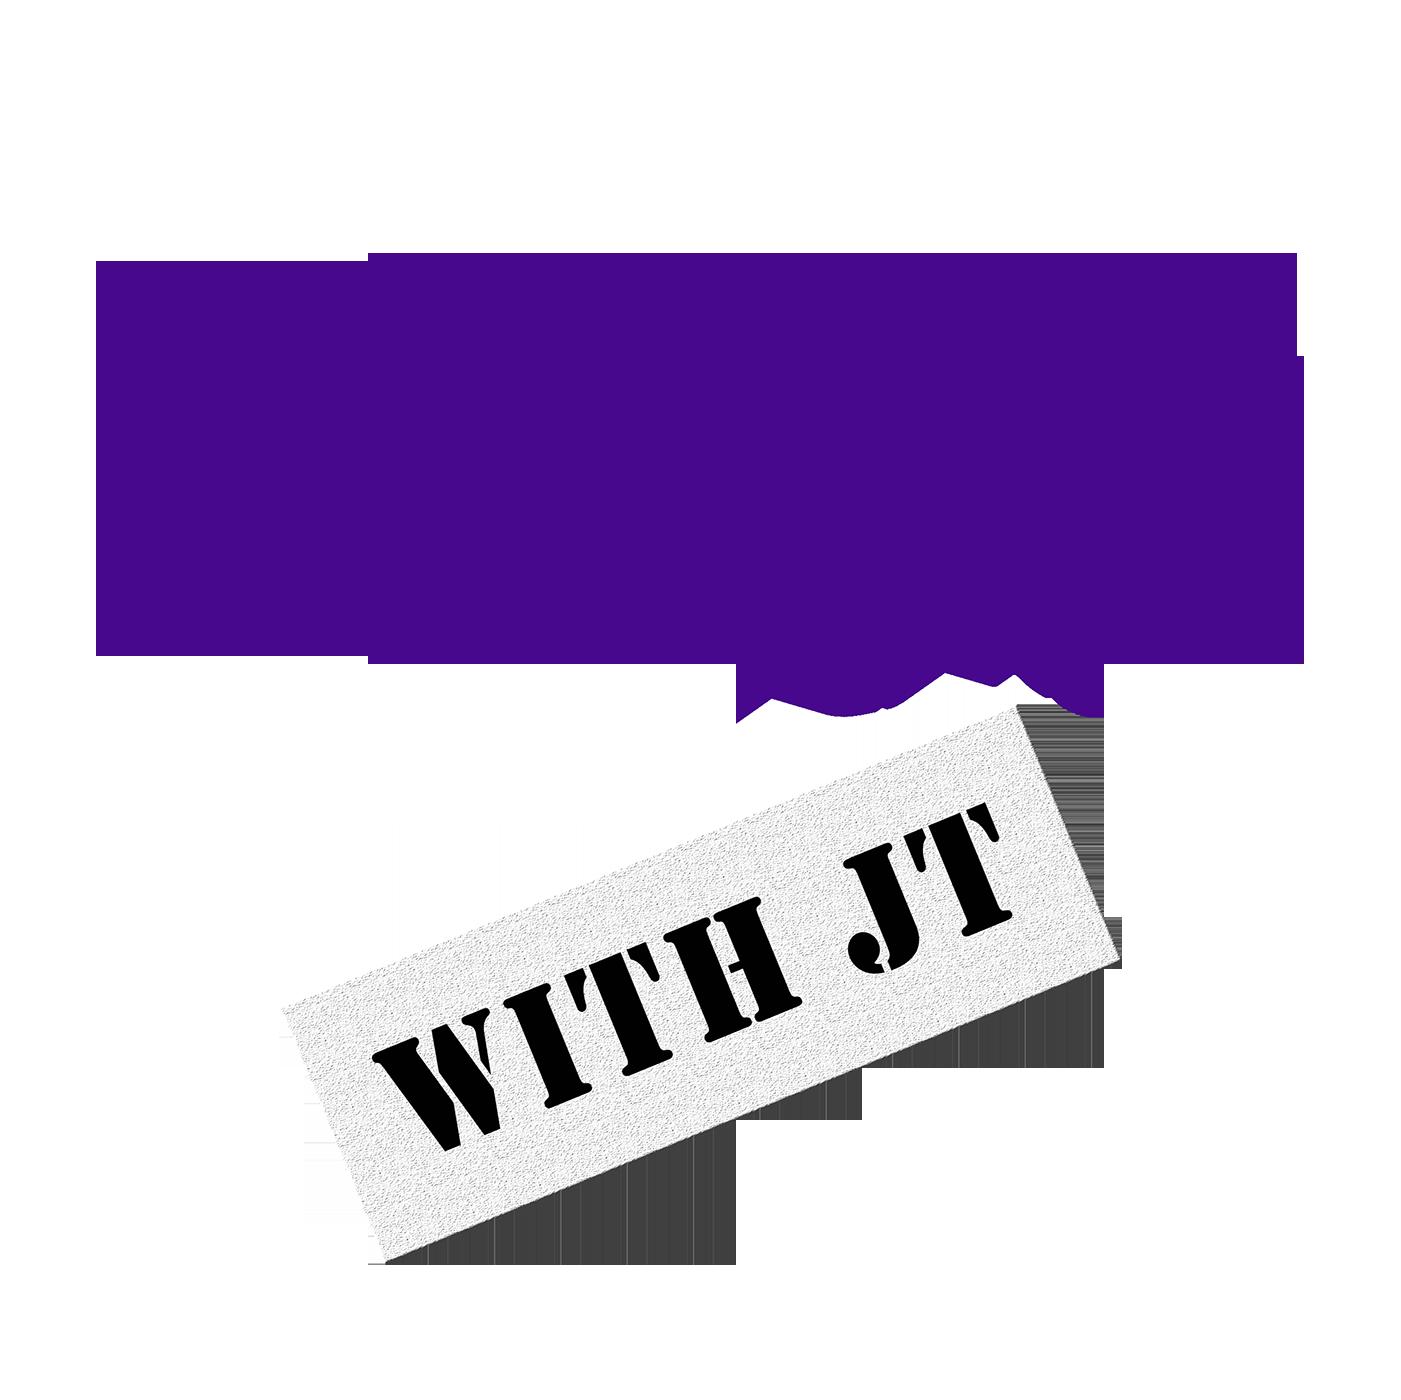 Discuss w/JT